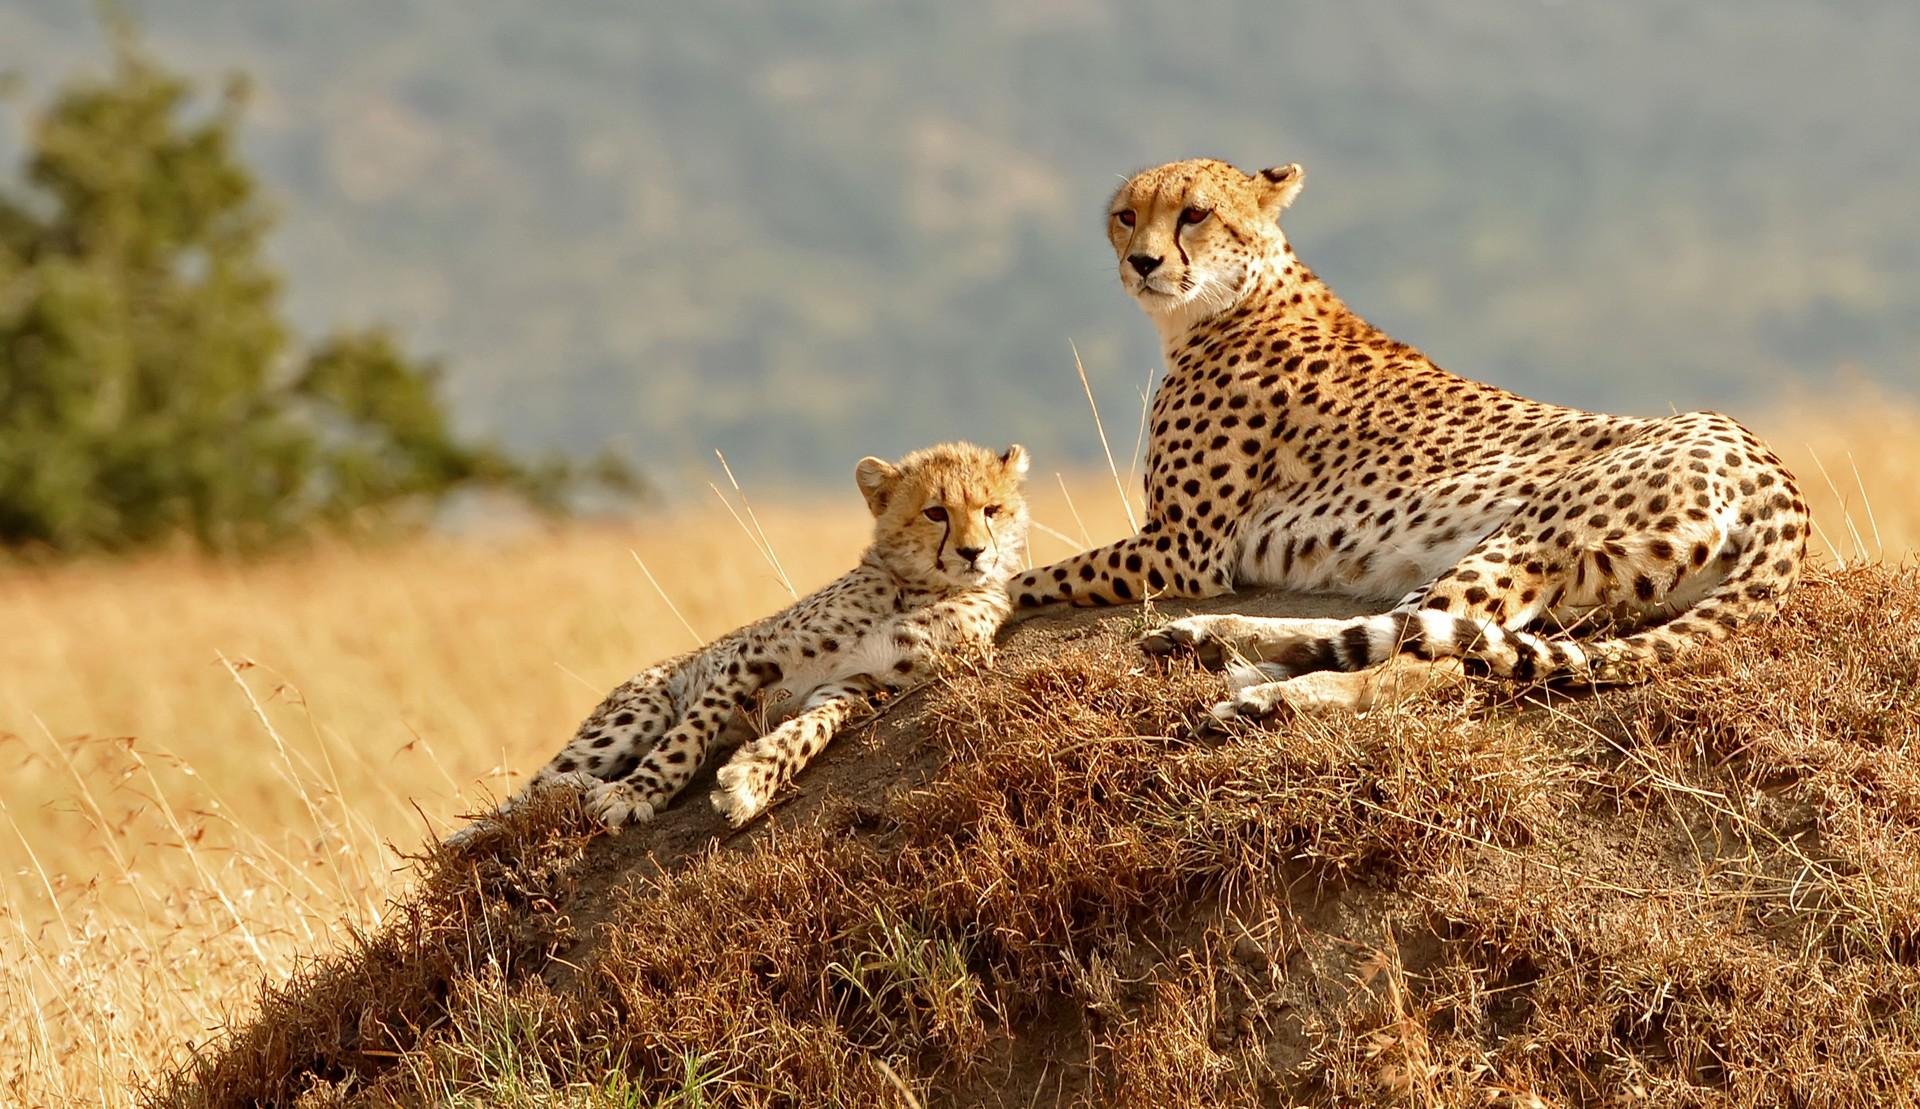 Cheetahs relaxing in the Masai Mara reserve